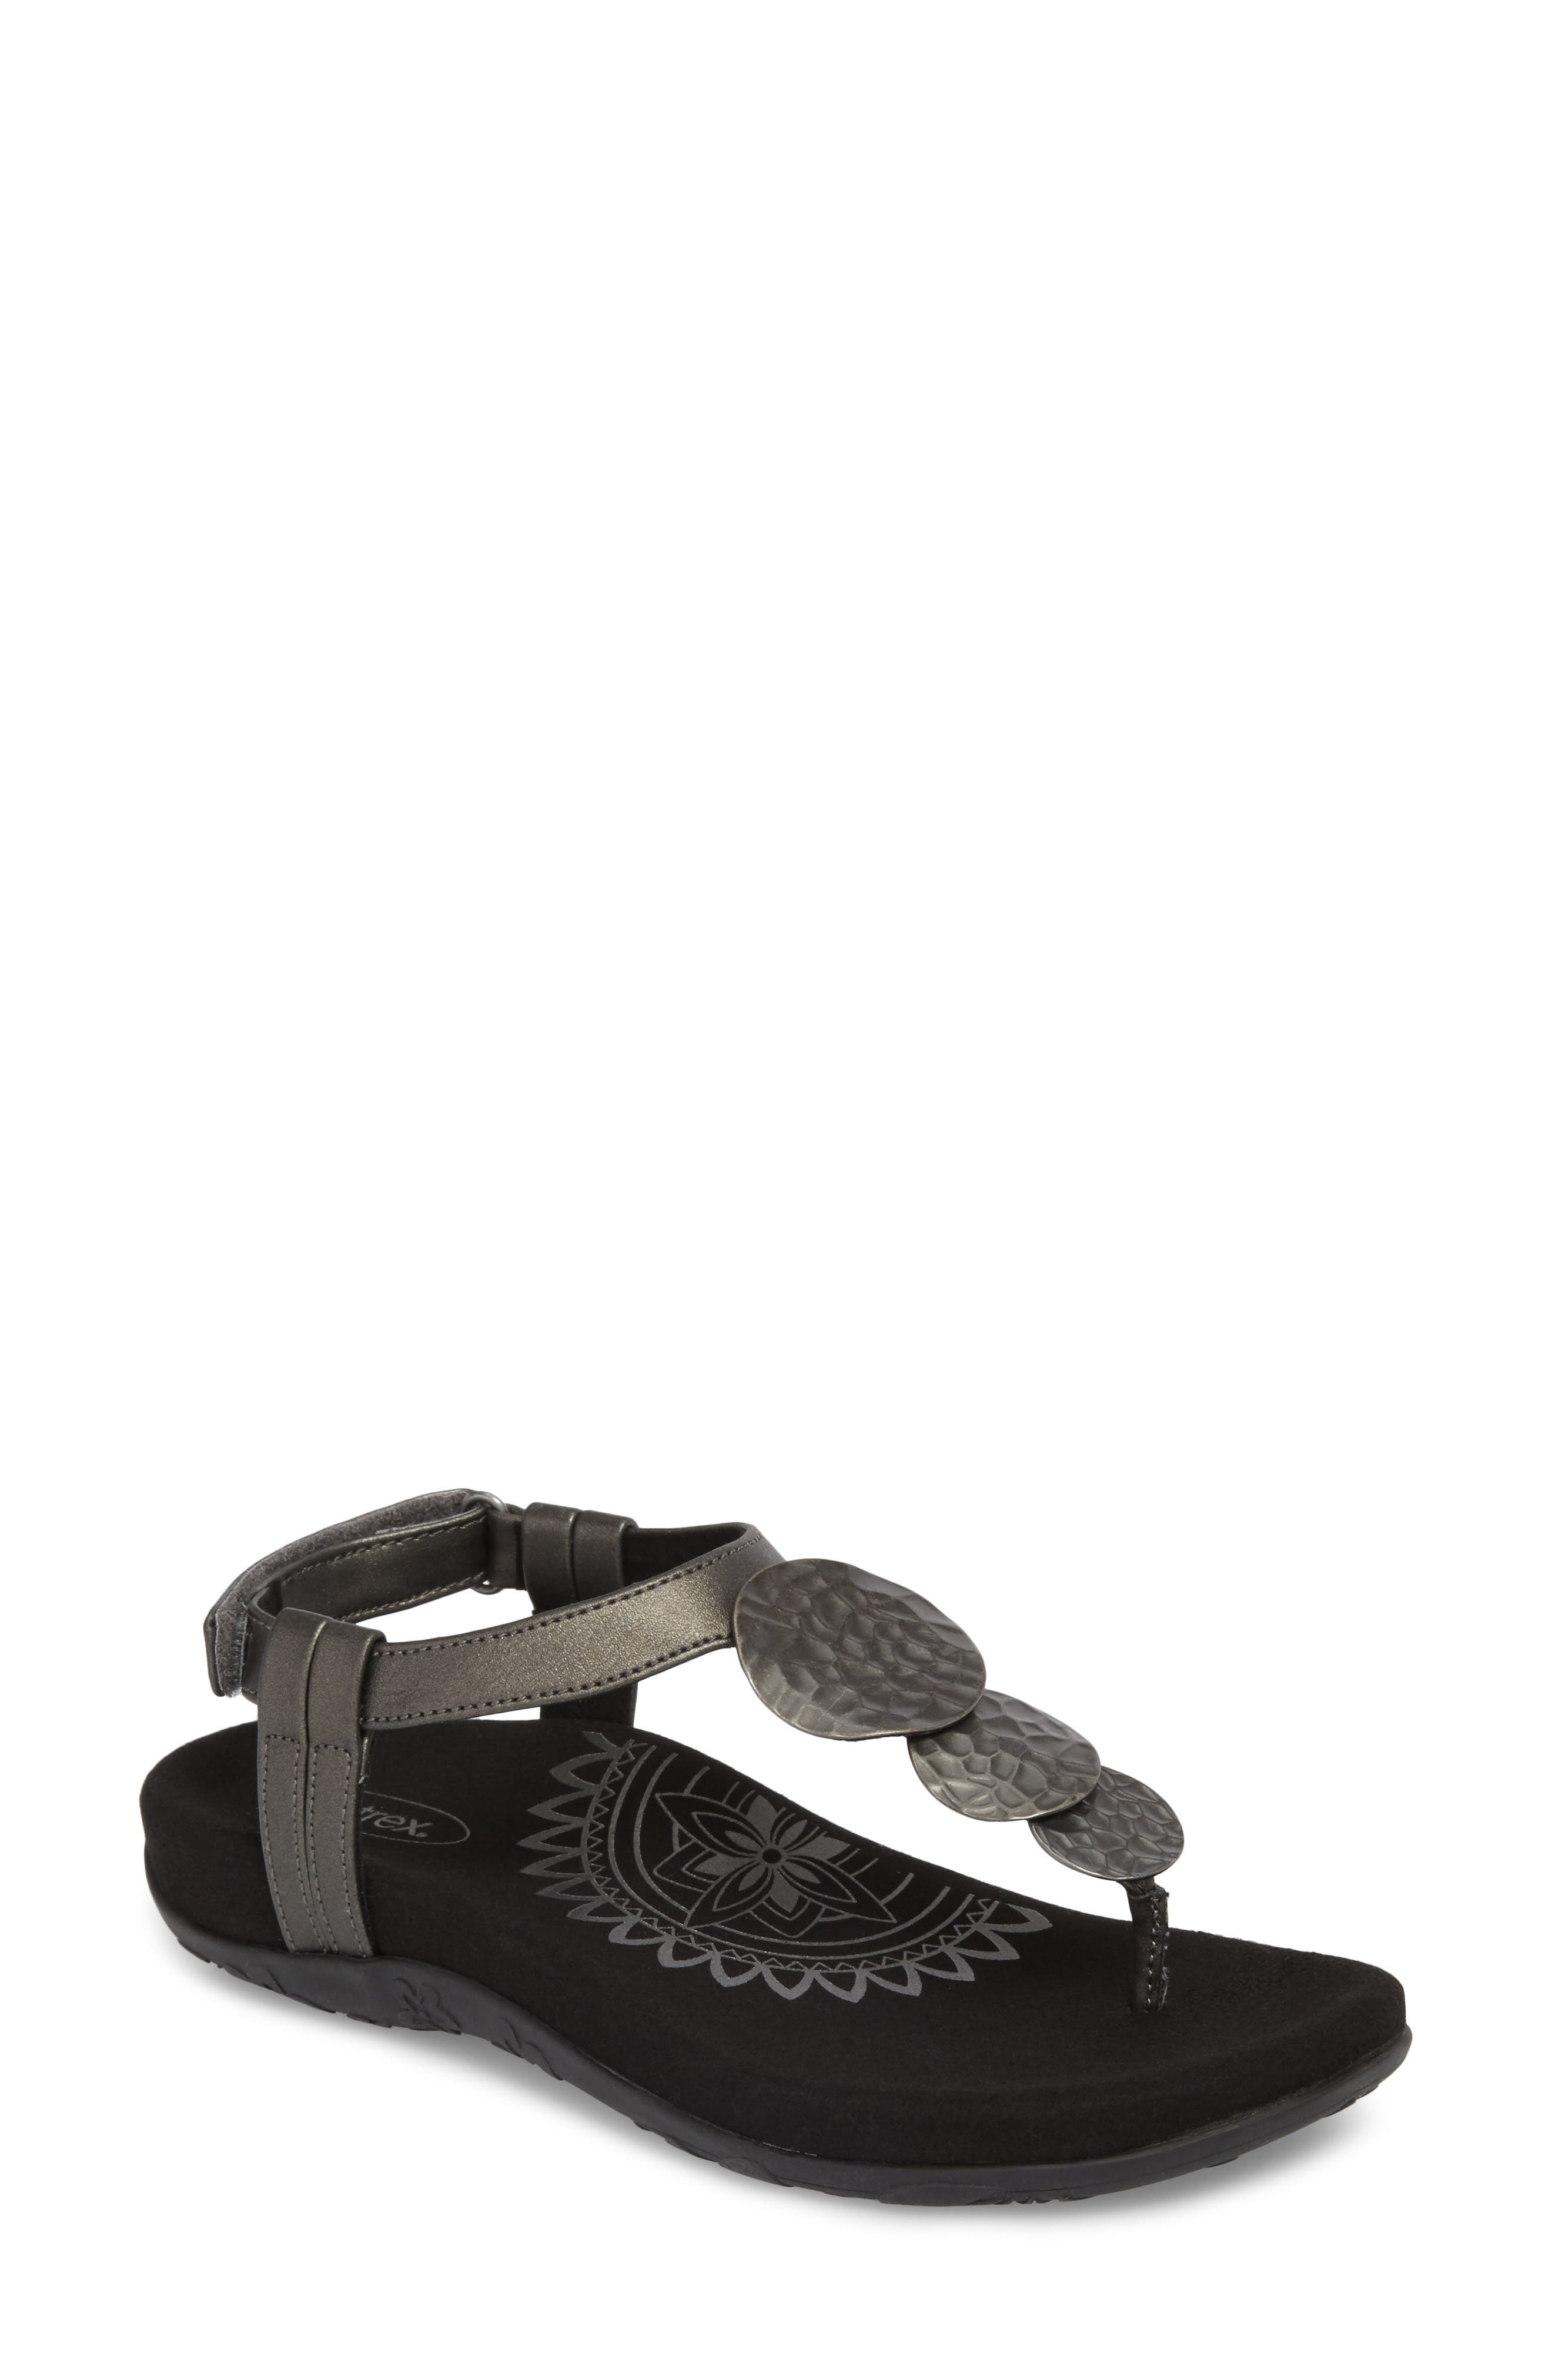 Olive T-Strap Sandal,                             Main thumbnail 1, color,                             Black Leather